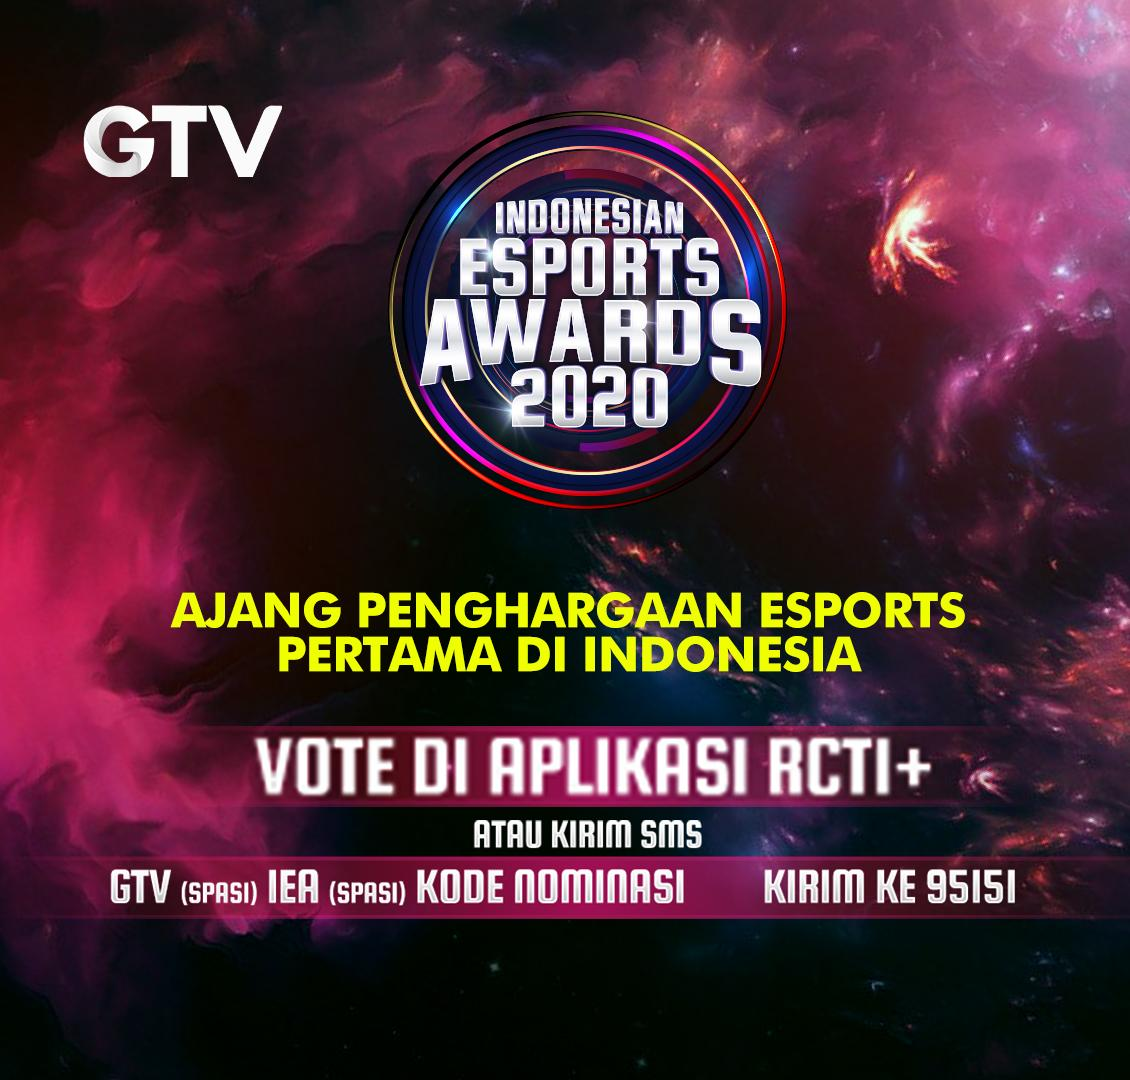 https: img.okezone.com content 2020 10 14 43 2293731 lewat-indonesia-esports-awards-gtv-gelar-ajang-penghargaan-esport-pertama-di-indonesia-tYsylBS9Gx.jpeg